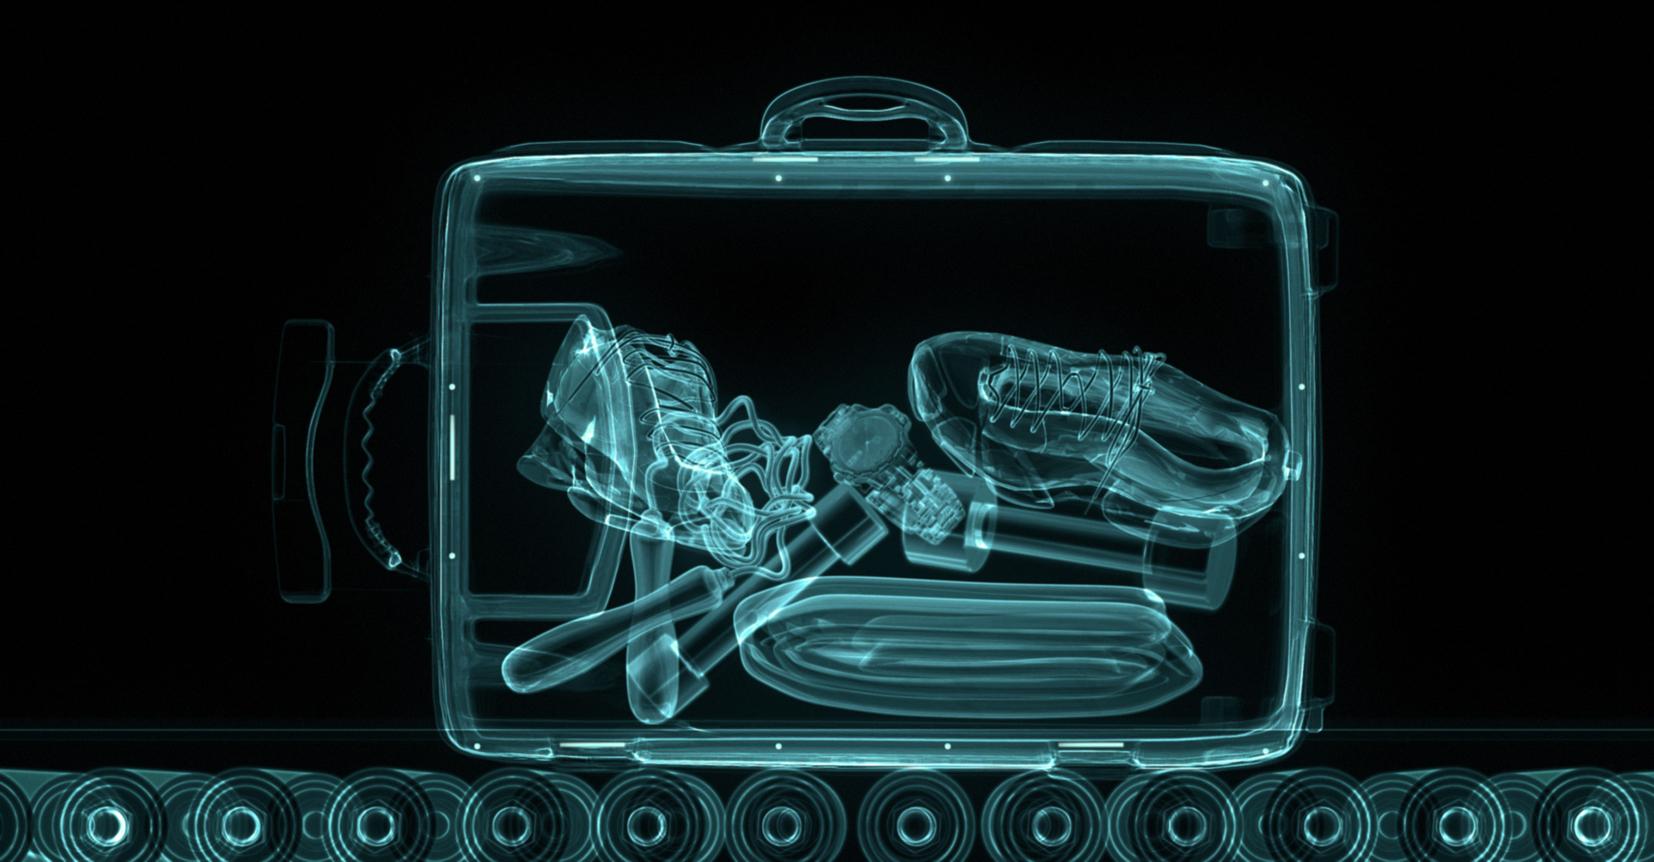 X-Ray Suitcase Conveyor Belt Fitness Equipment SOBeFiT Magazine